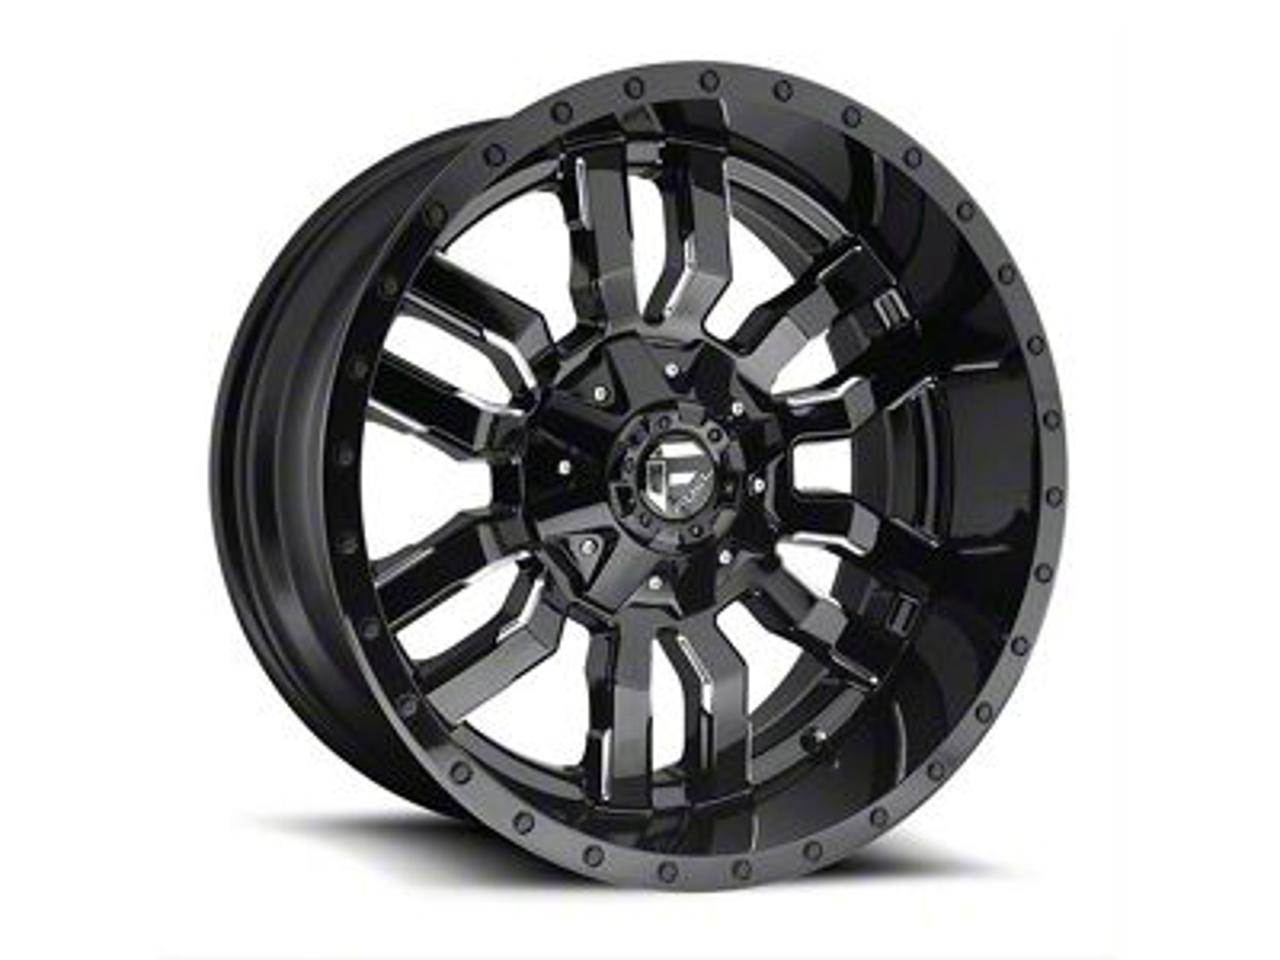 Fuel Wheels Sledge Matte Black 5-Lug Wheel - 20x9 (02-18 RAM 1500, Excluding Mega Cab)